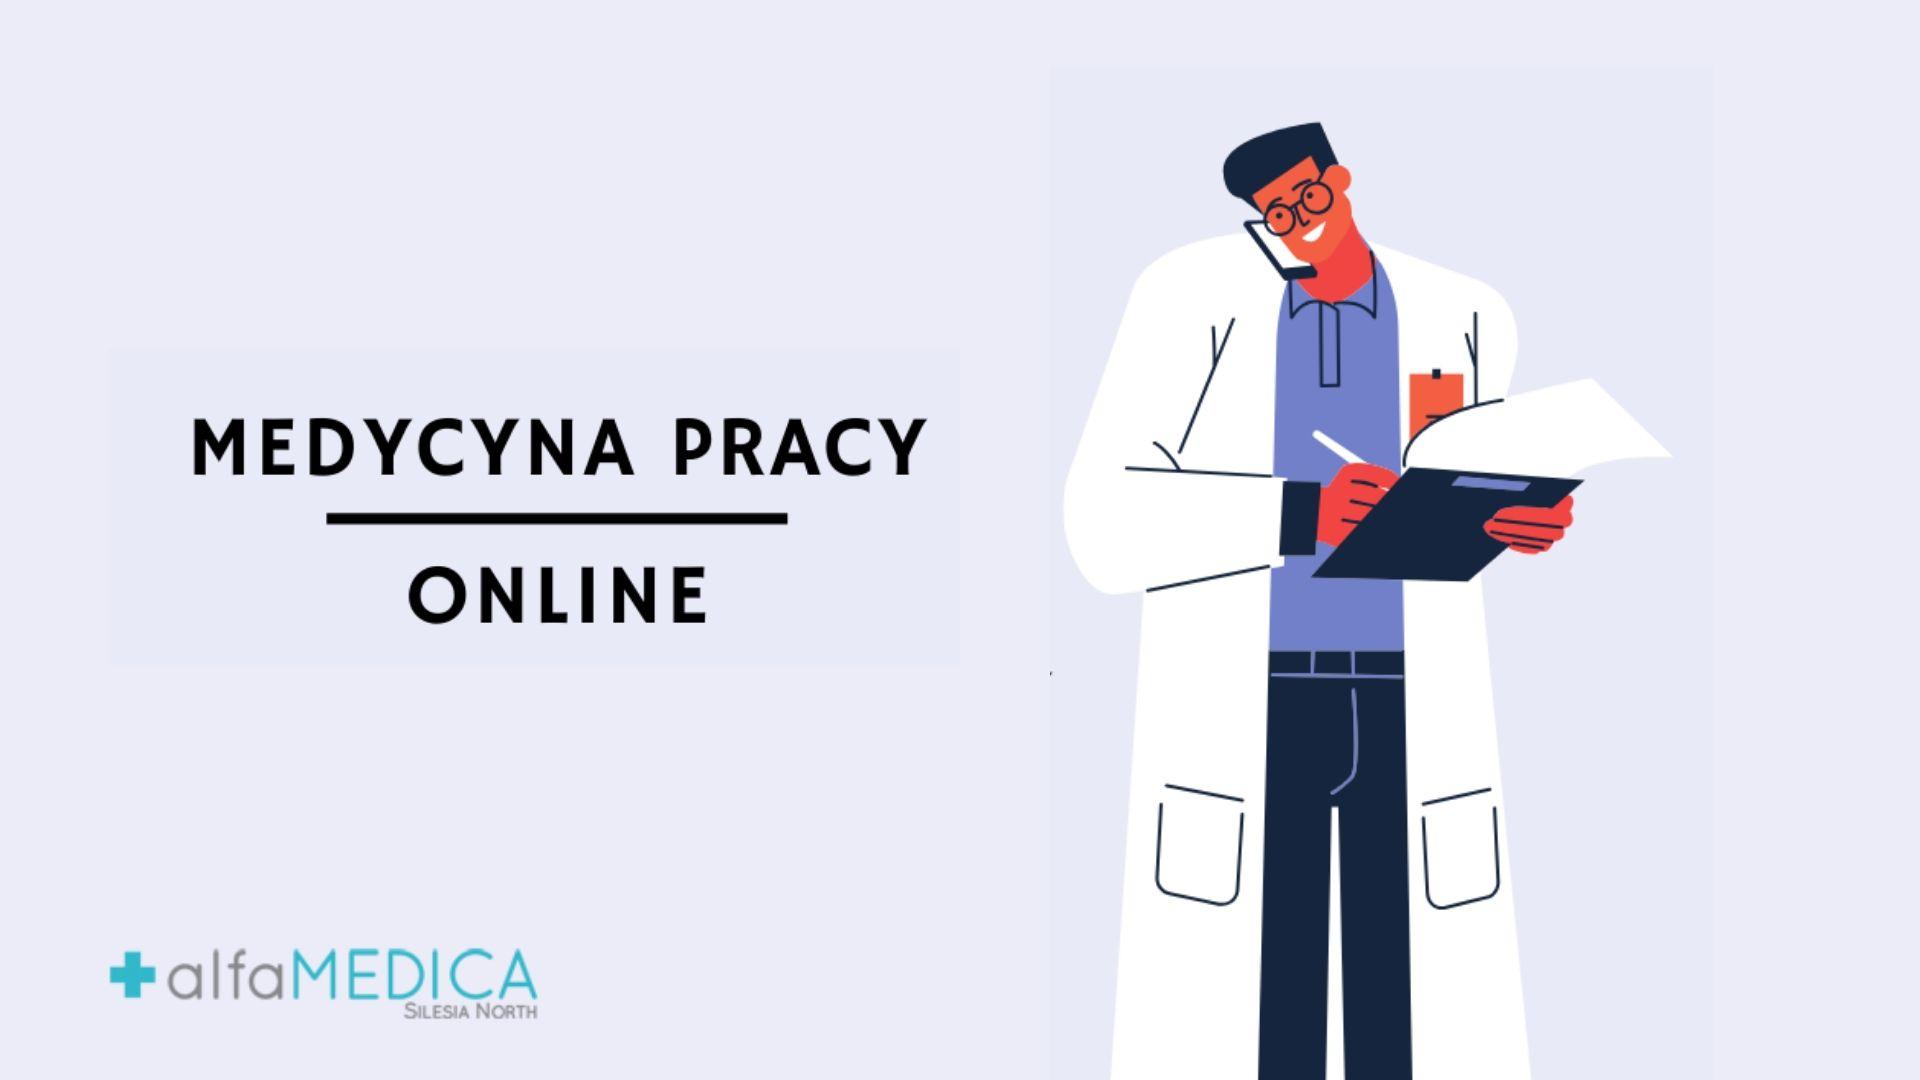 medycyna pracy online